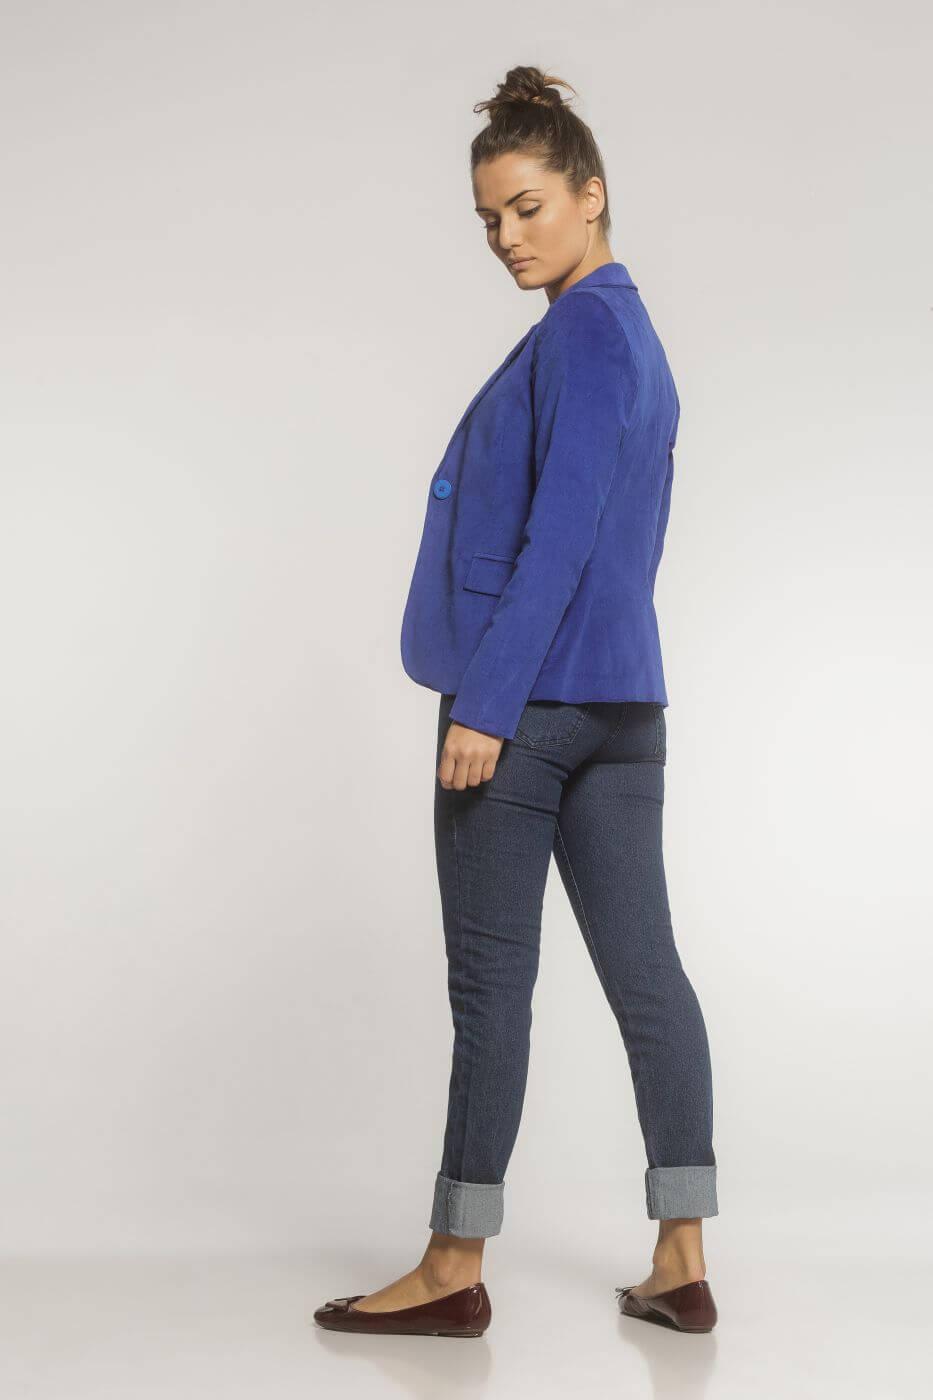 Blazer Feminino Alfaiataria Clássico Veludo Azul Bic